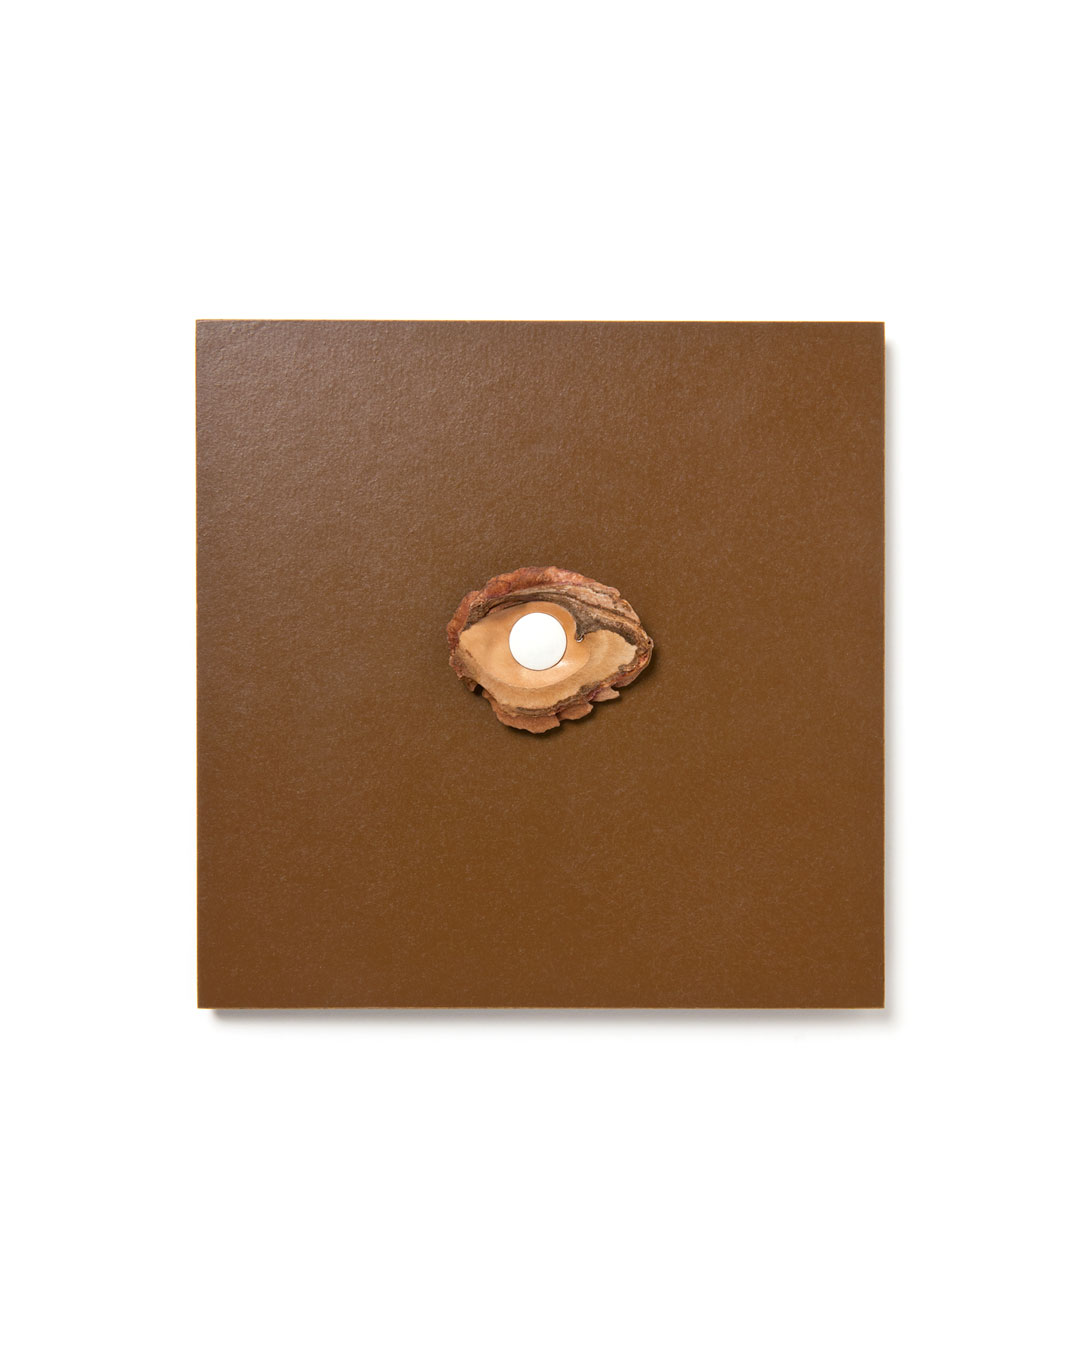 Otto Künzli, Auge V (Eye V), 2017, brooch; HDF, peach stone, sepiolite, Polystyrol, gold, 110 x 110 x 12 mm, €4300